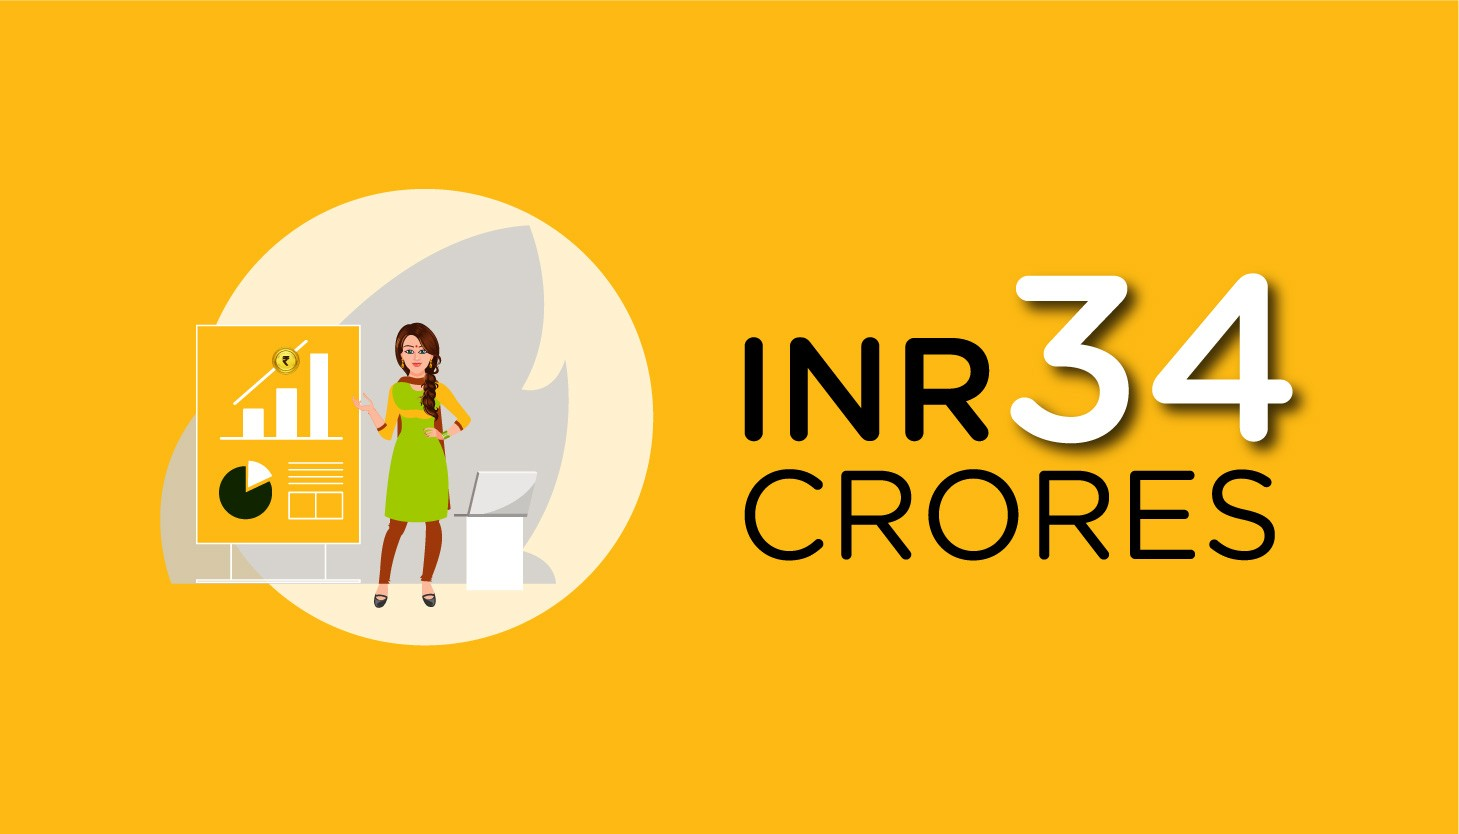 INR 34 Crores